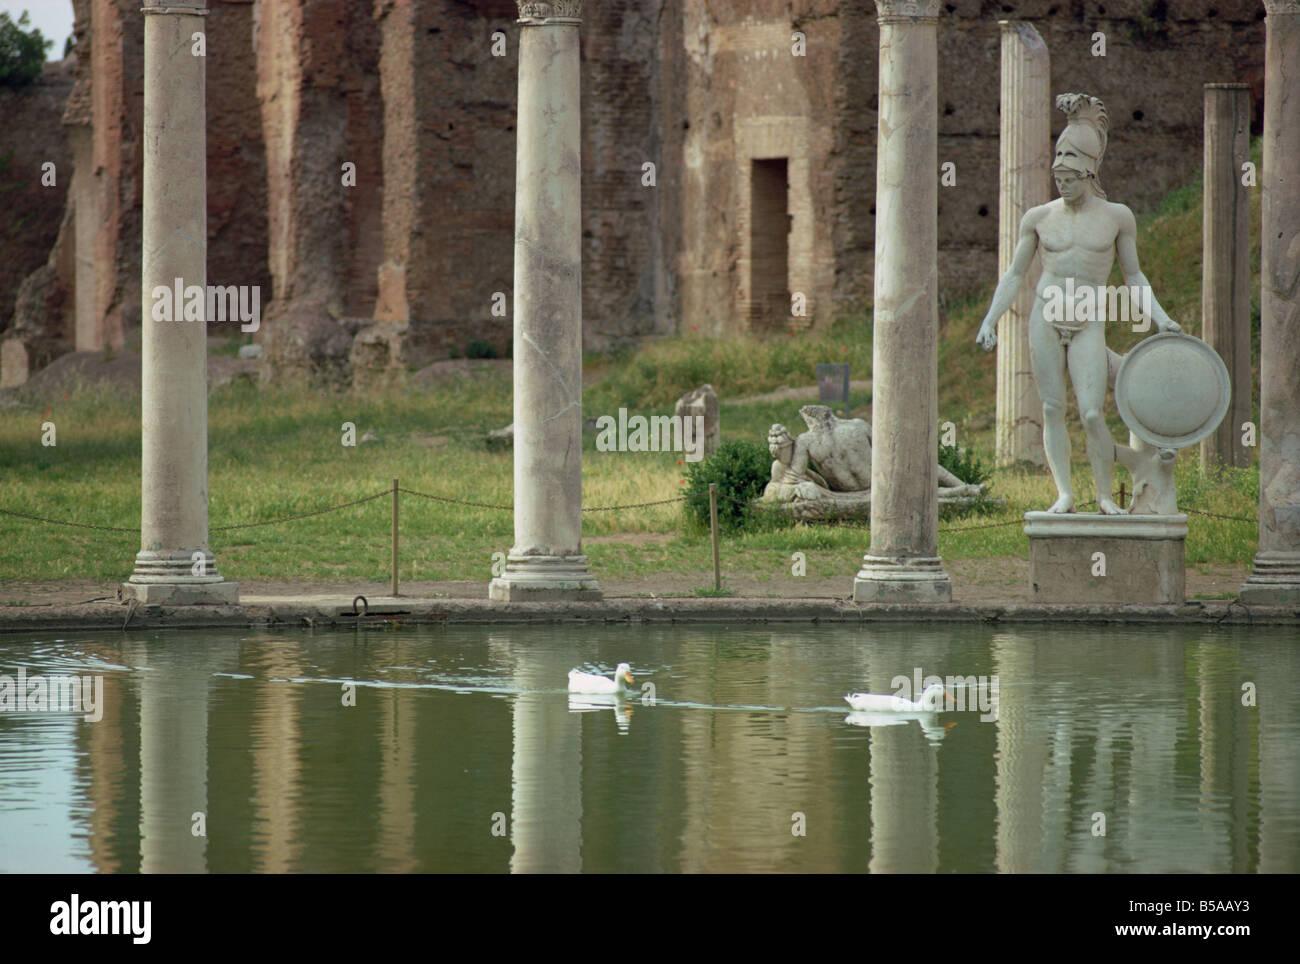 Hadrian's Villa, UNESCO World Heritage Site, Tivoli, Lazio, Italy, Europe - Stock Image